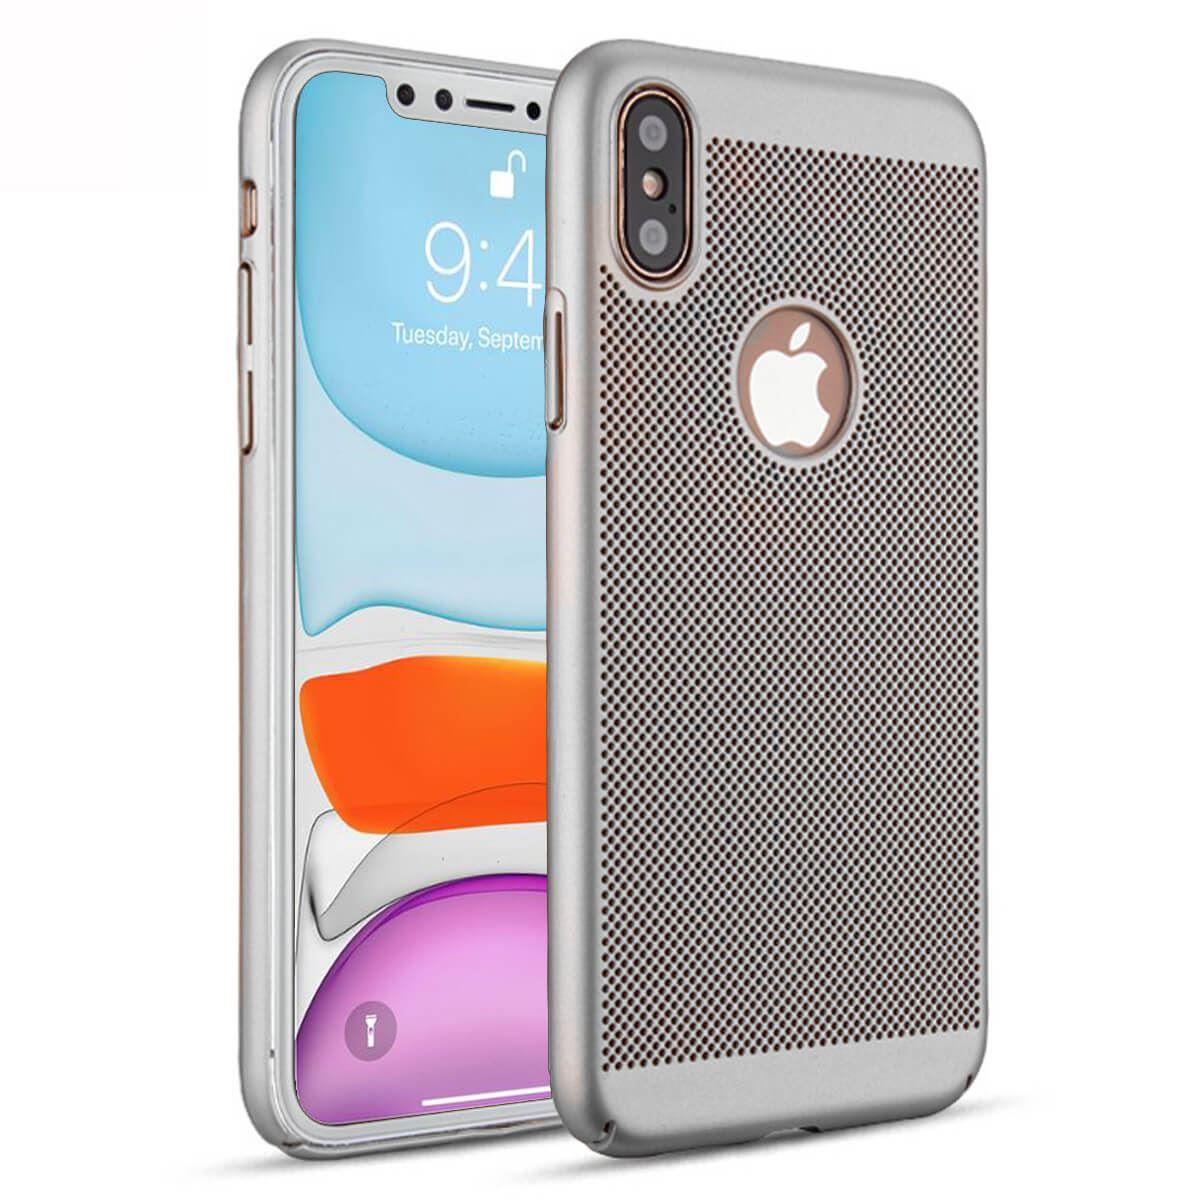 Ultra-Thin-Case-Apple-iPhone-10-X-8-7-6s-5s-Luxury-Slim-PC-Mesh-Hard-Back-Cover thumbnail 23